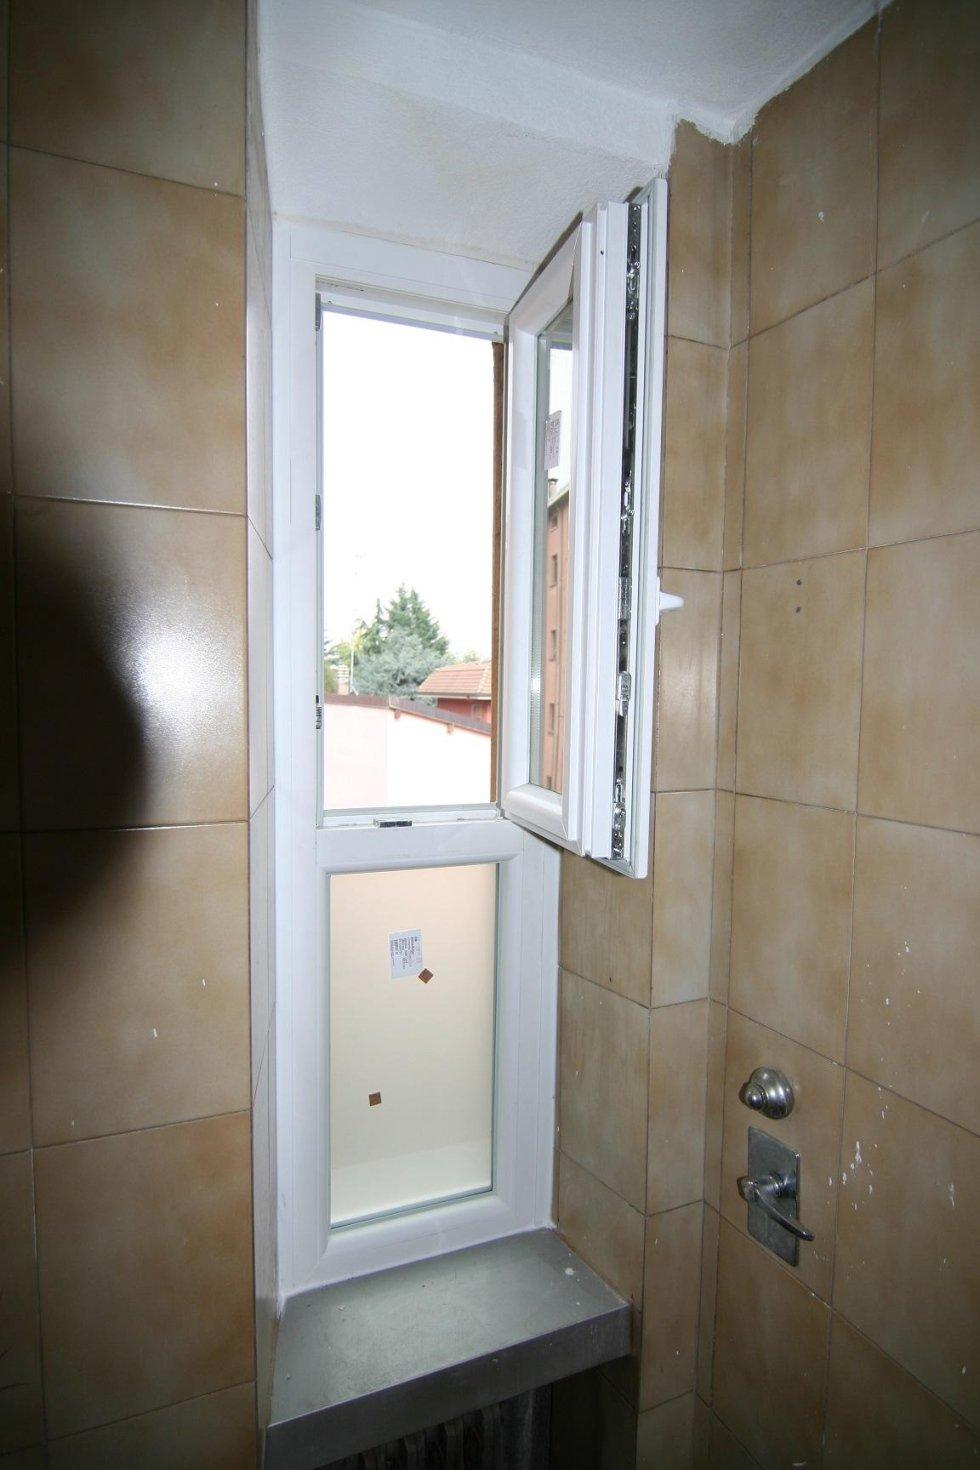 finestra aperta in bagno